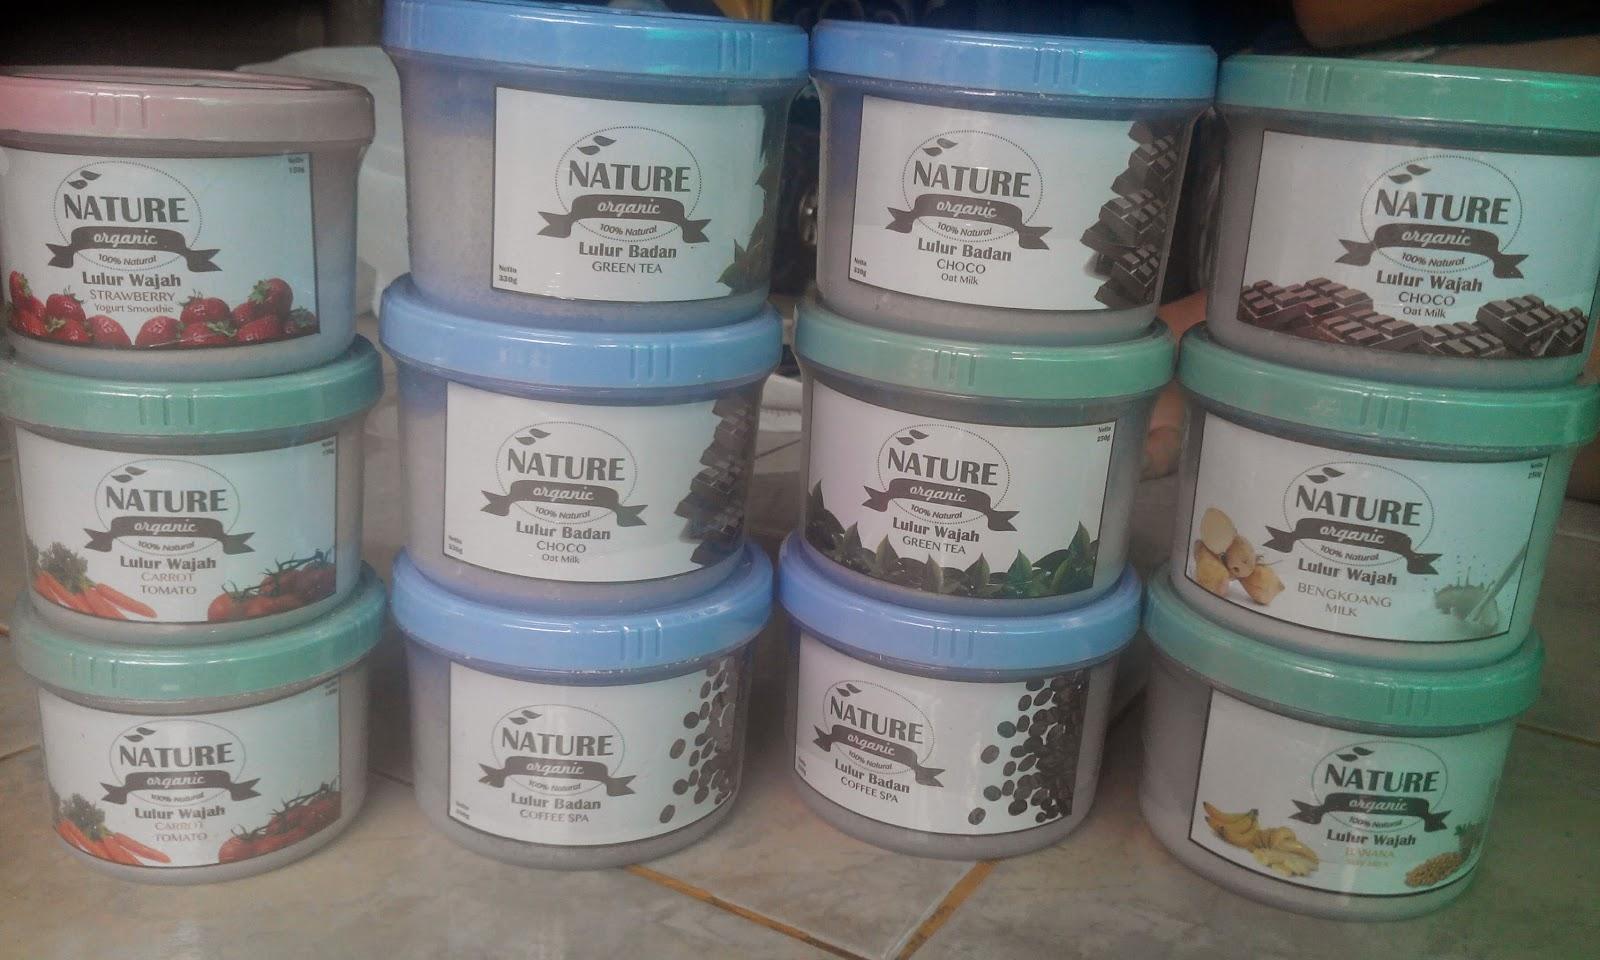 Nature Organic Lulur Badan Bengkoang Milk Spa 330gr Daftar Harga Wajah Happy Shopping